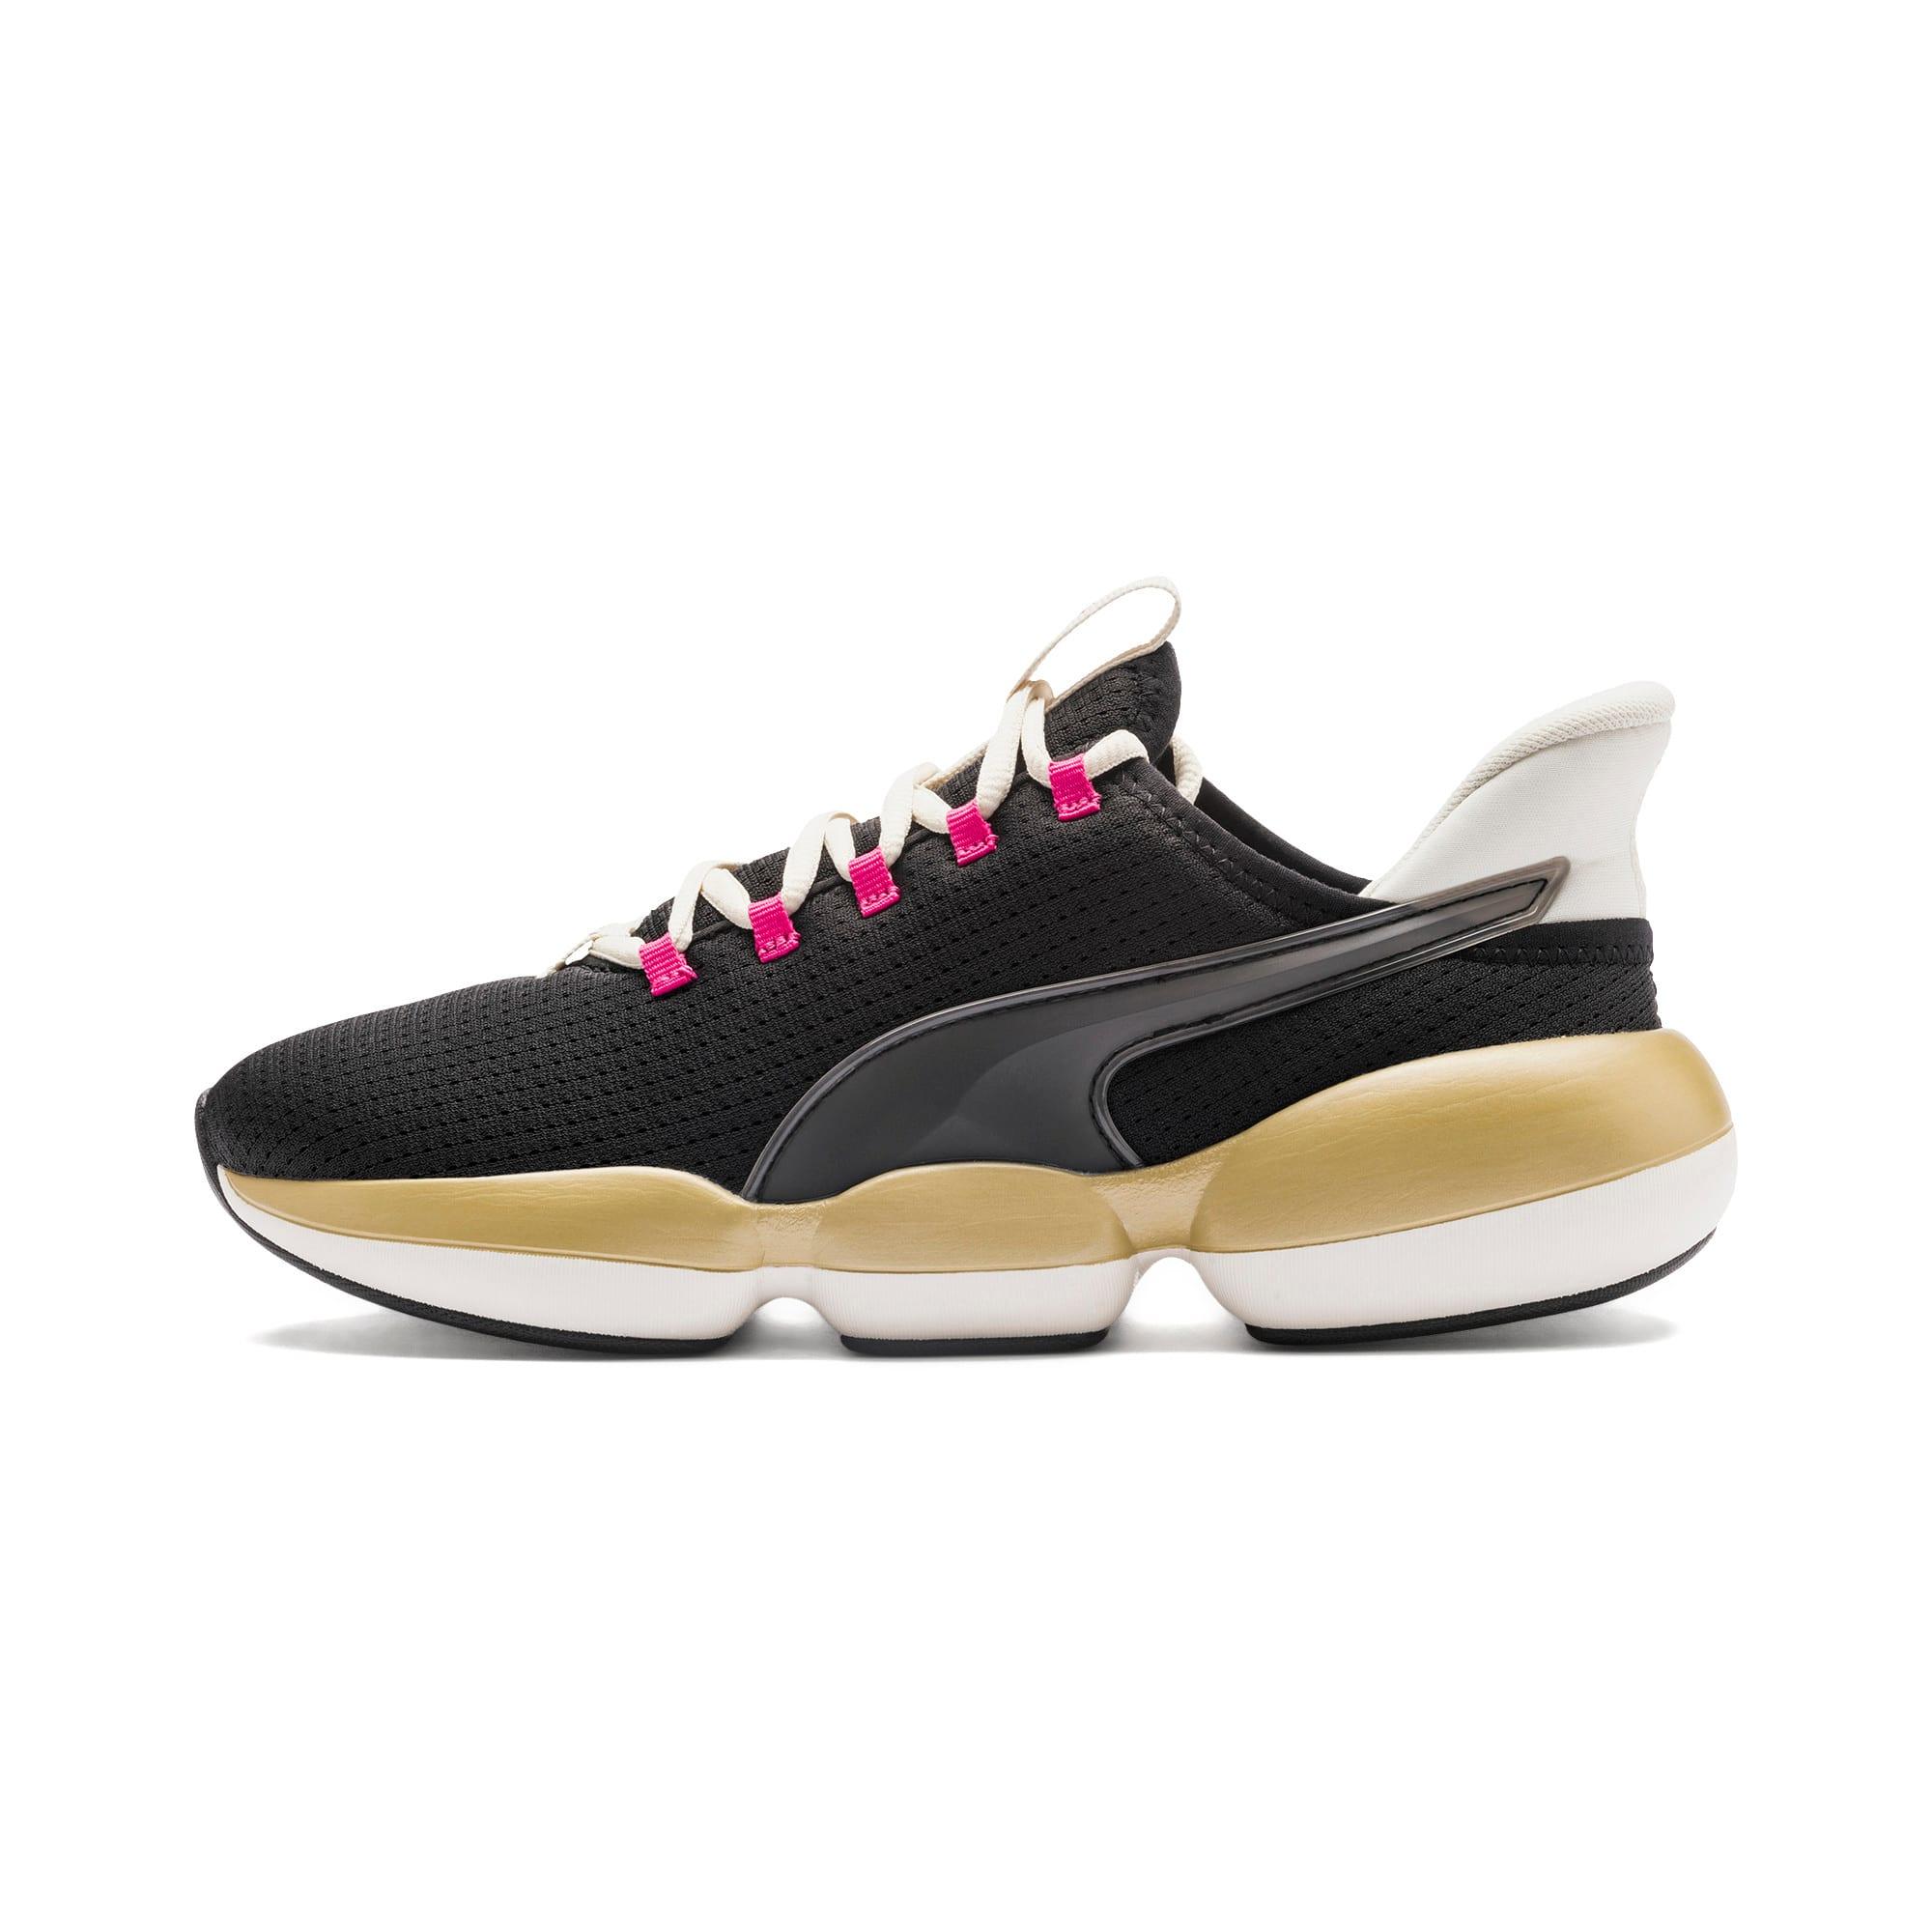 Thumbnail 1 of Mode XT Sweet Damen Sneaker, Black- White-Purple, medium